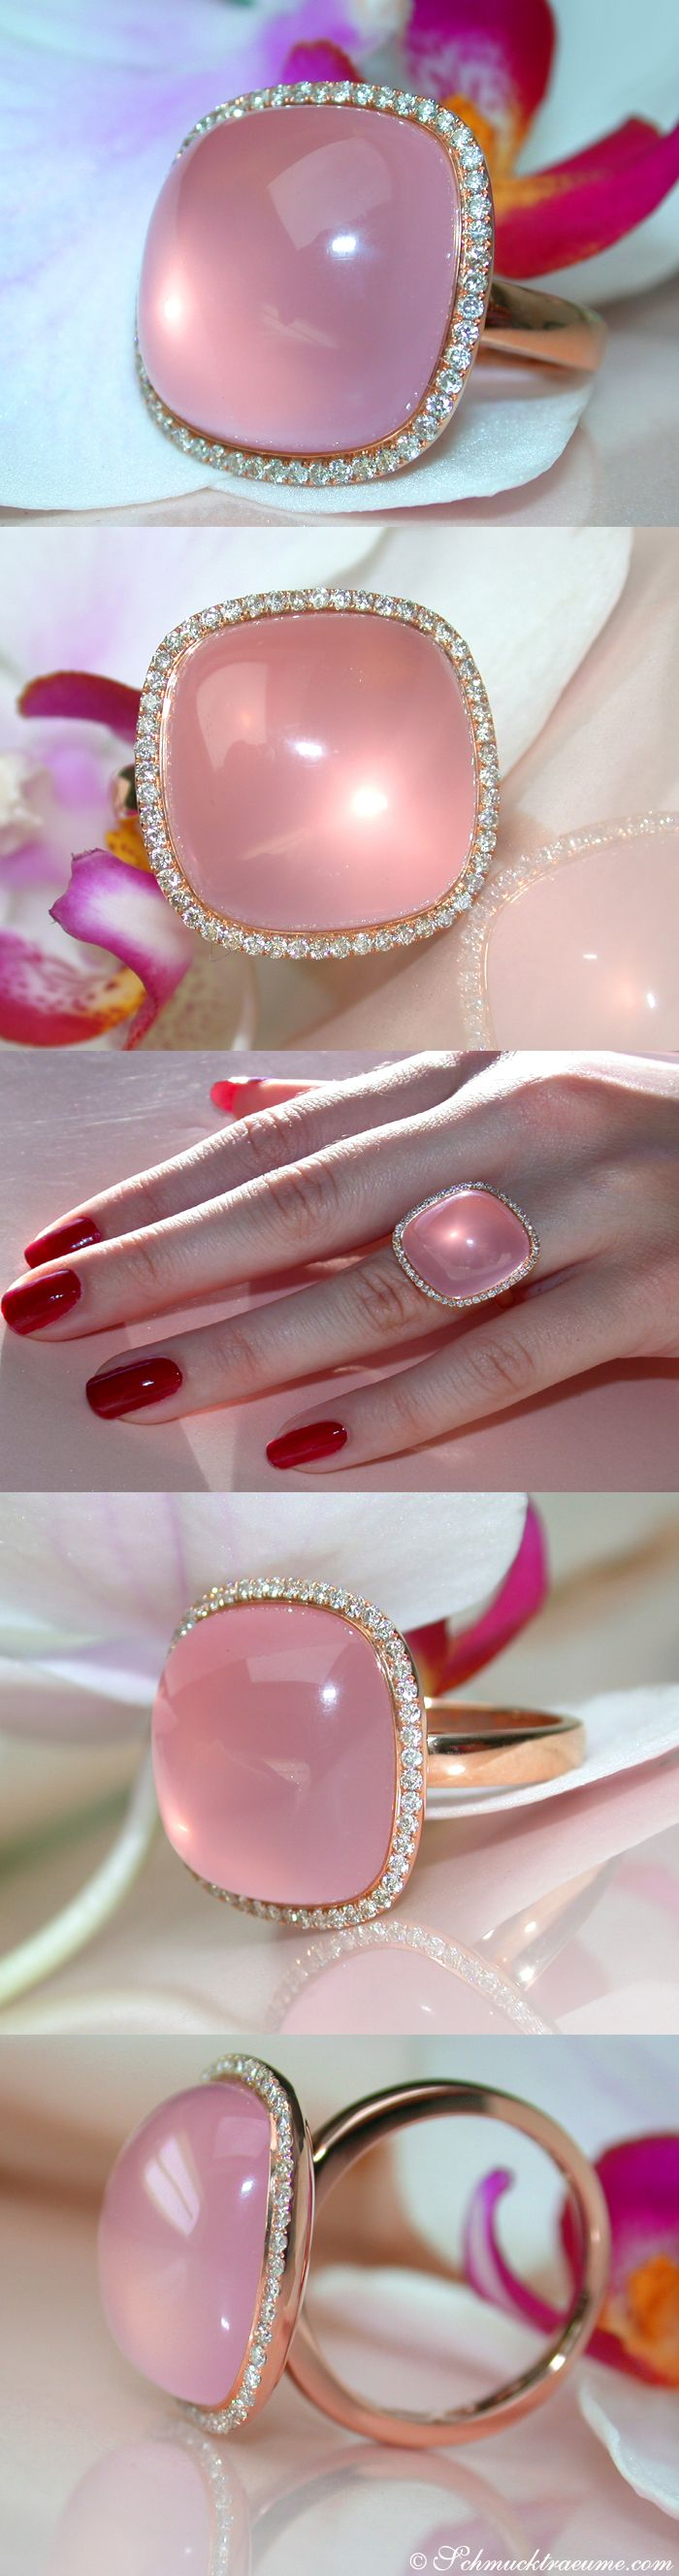 16225 best Things I love images on Pinterest | Jewelery, Gemstones ...